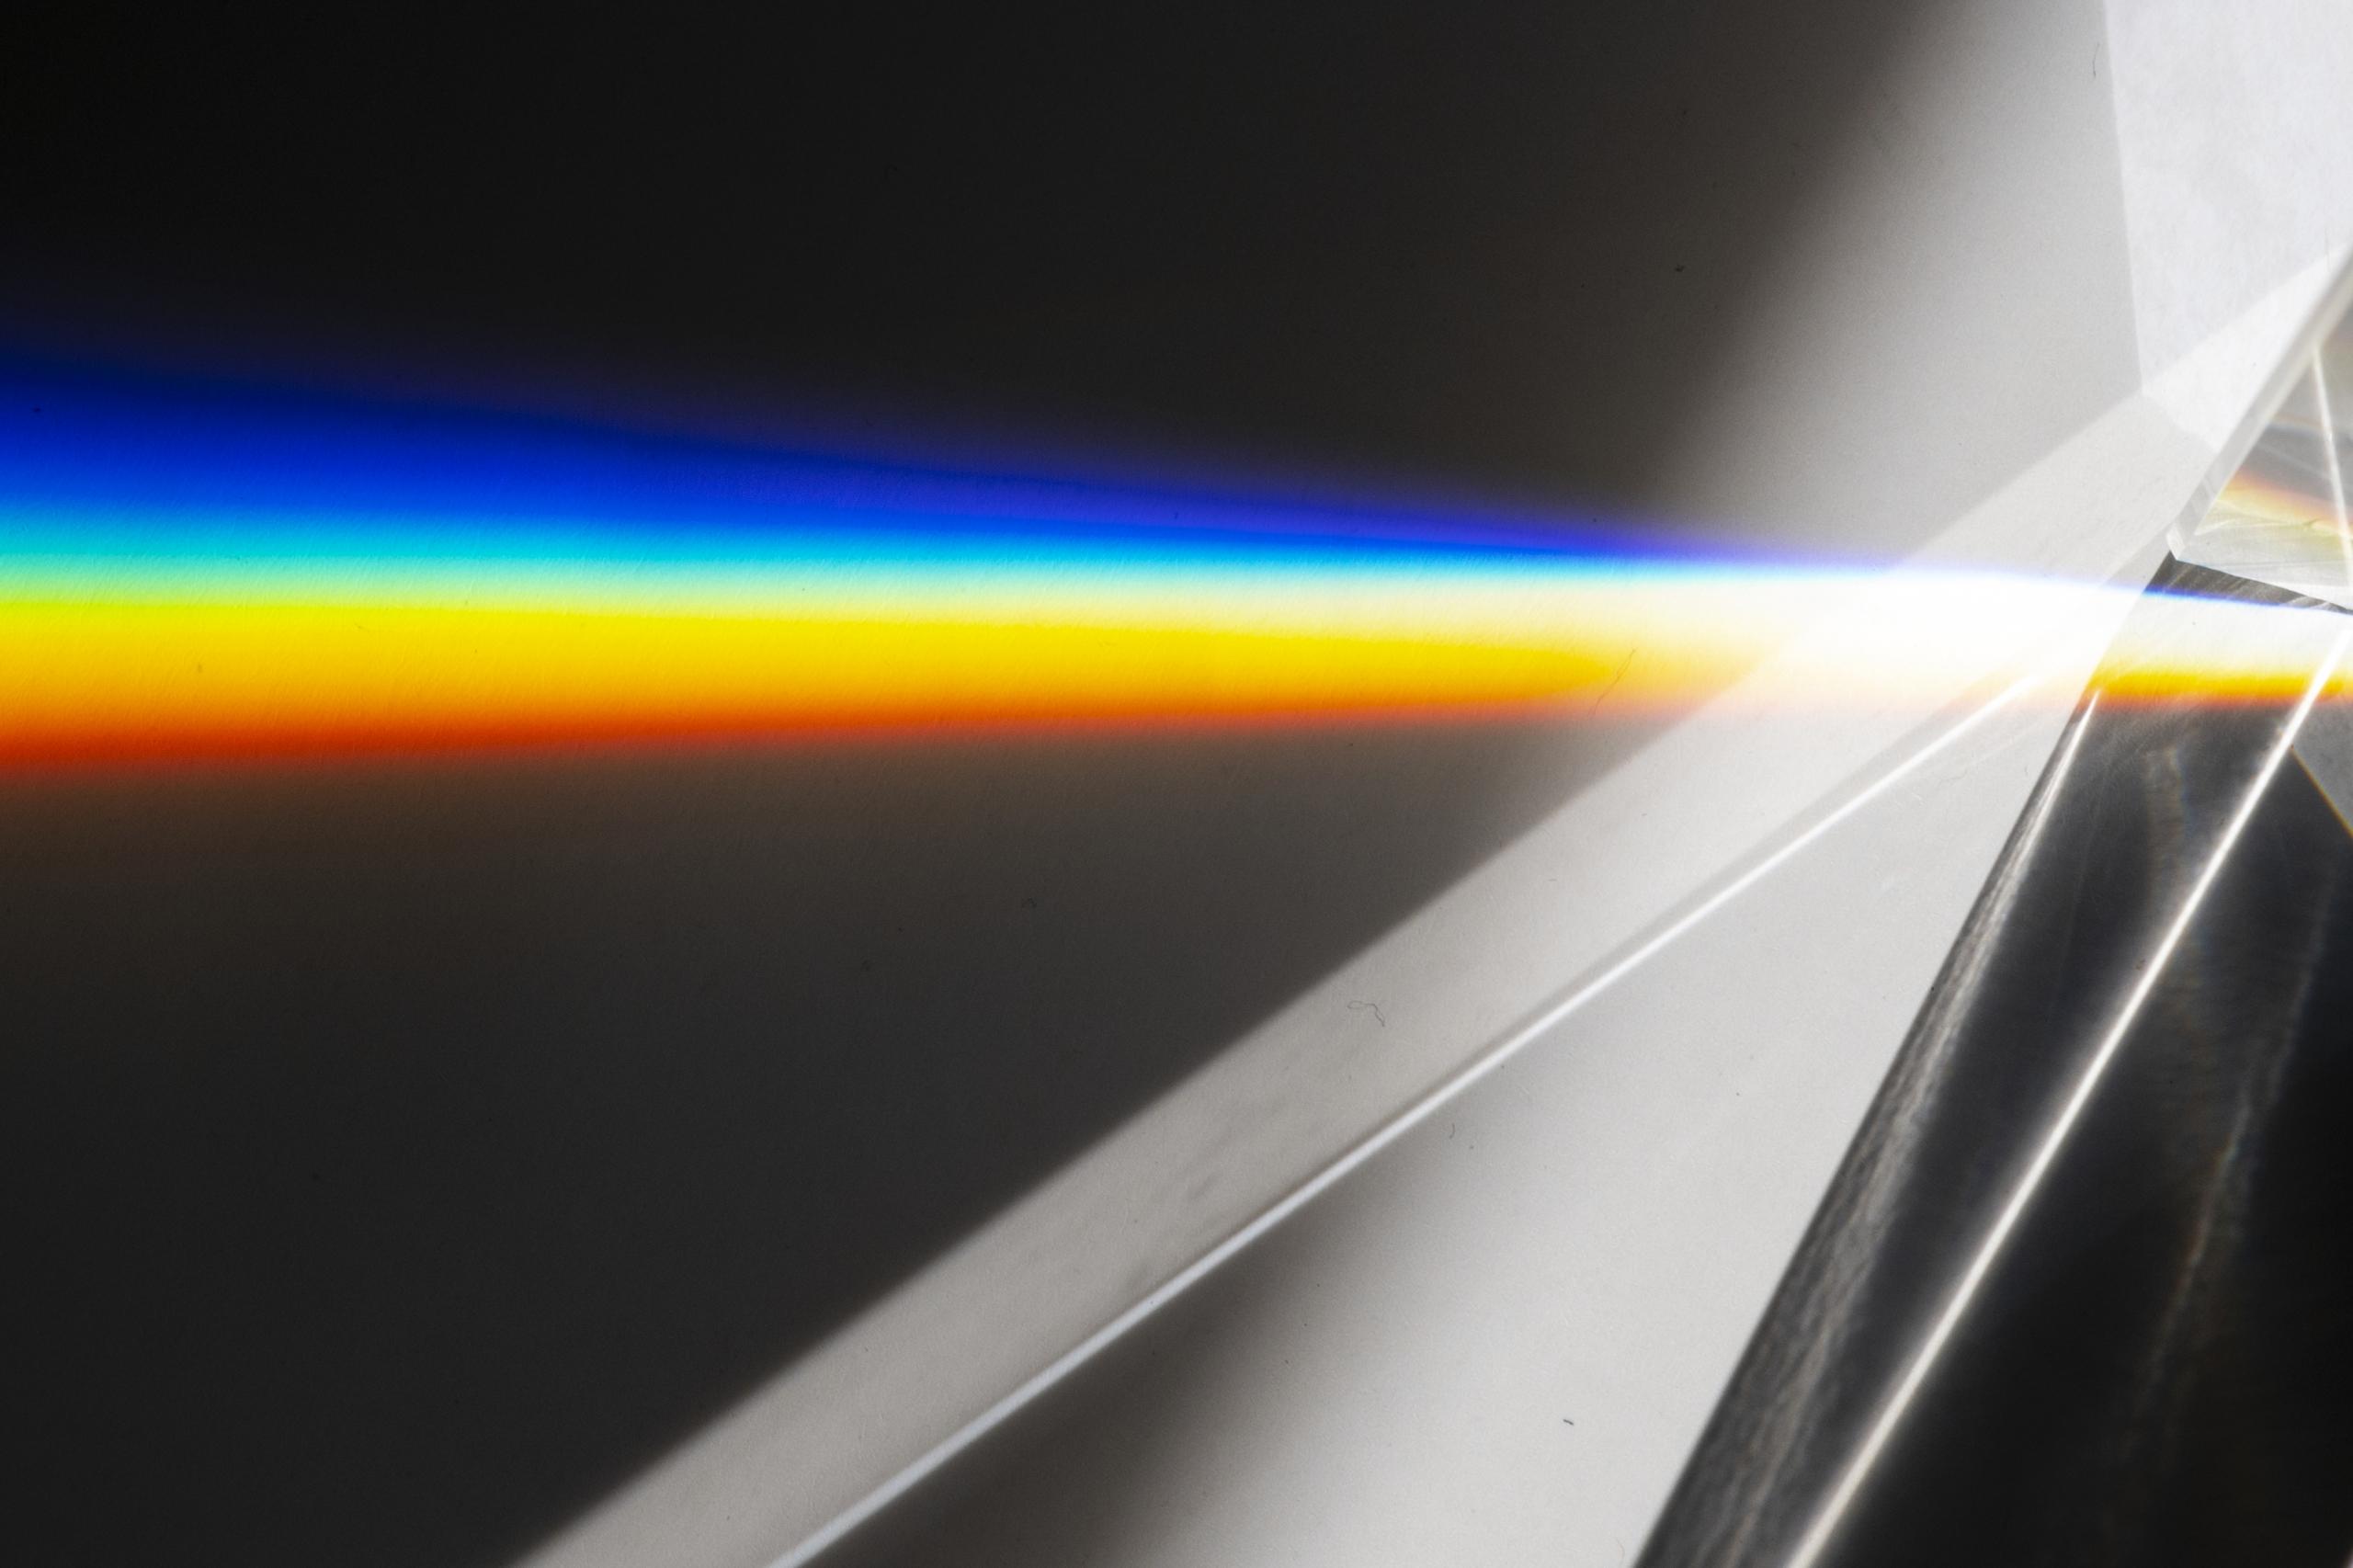 Light beam shining through a prism creating a rainbow beam.